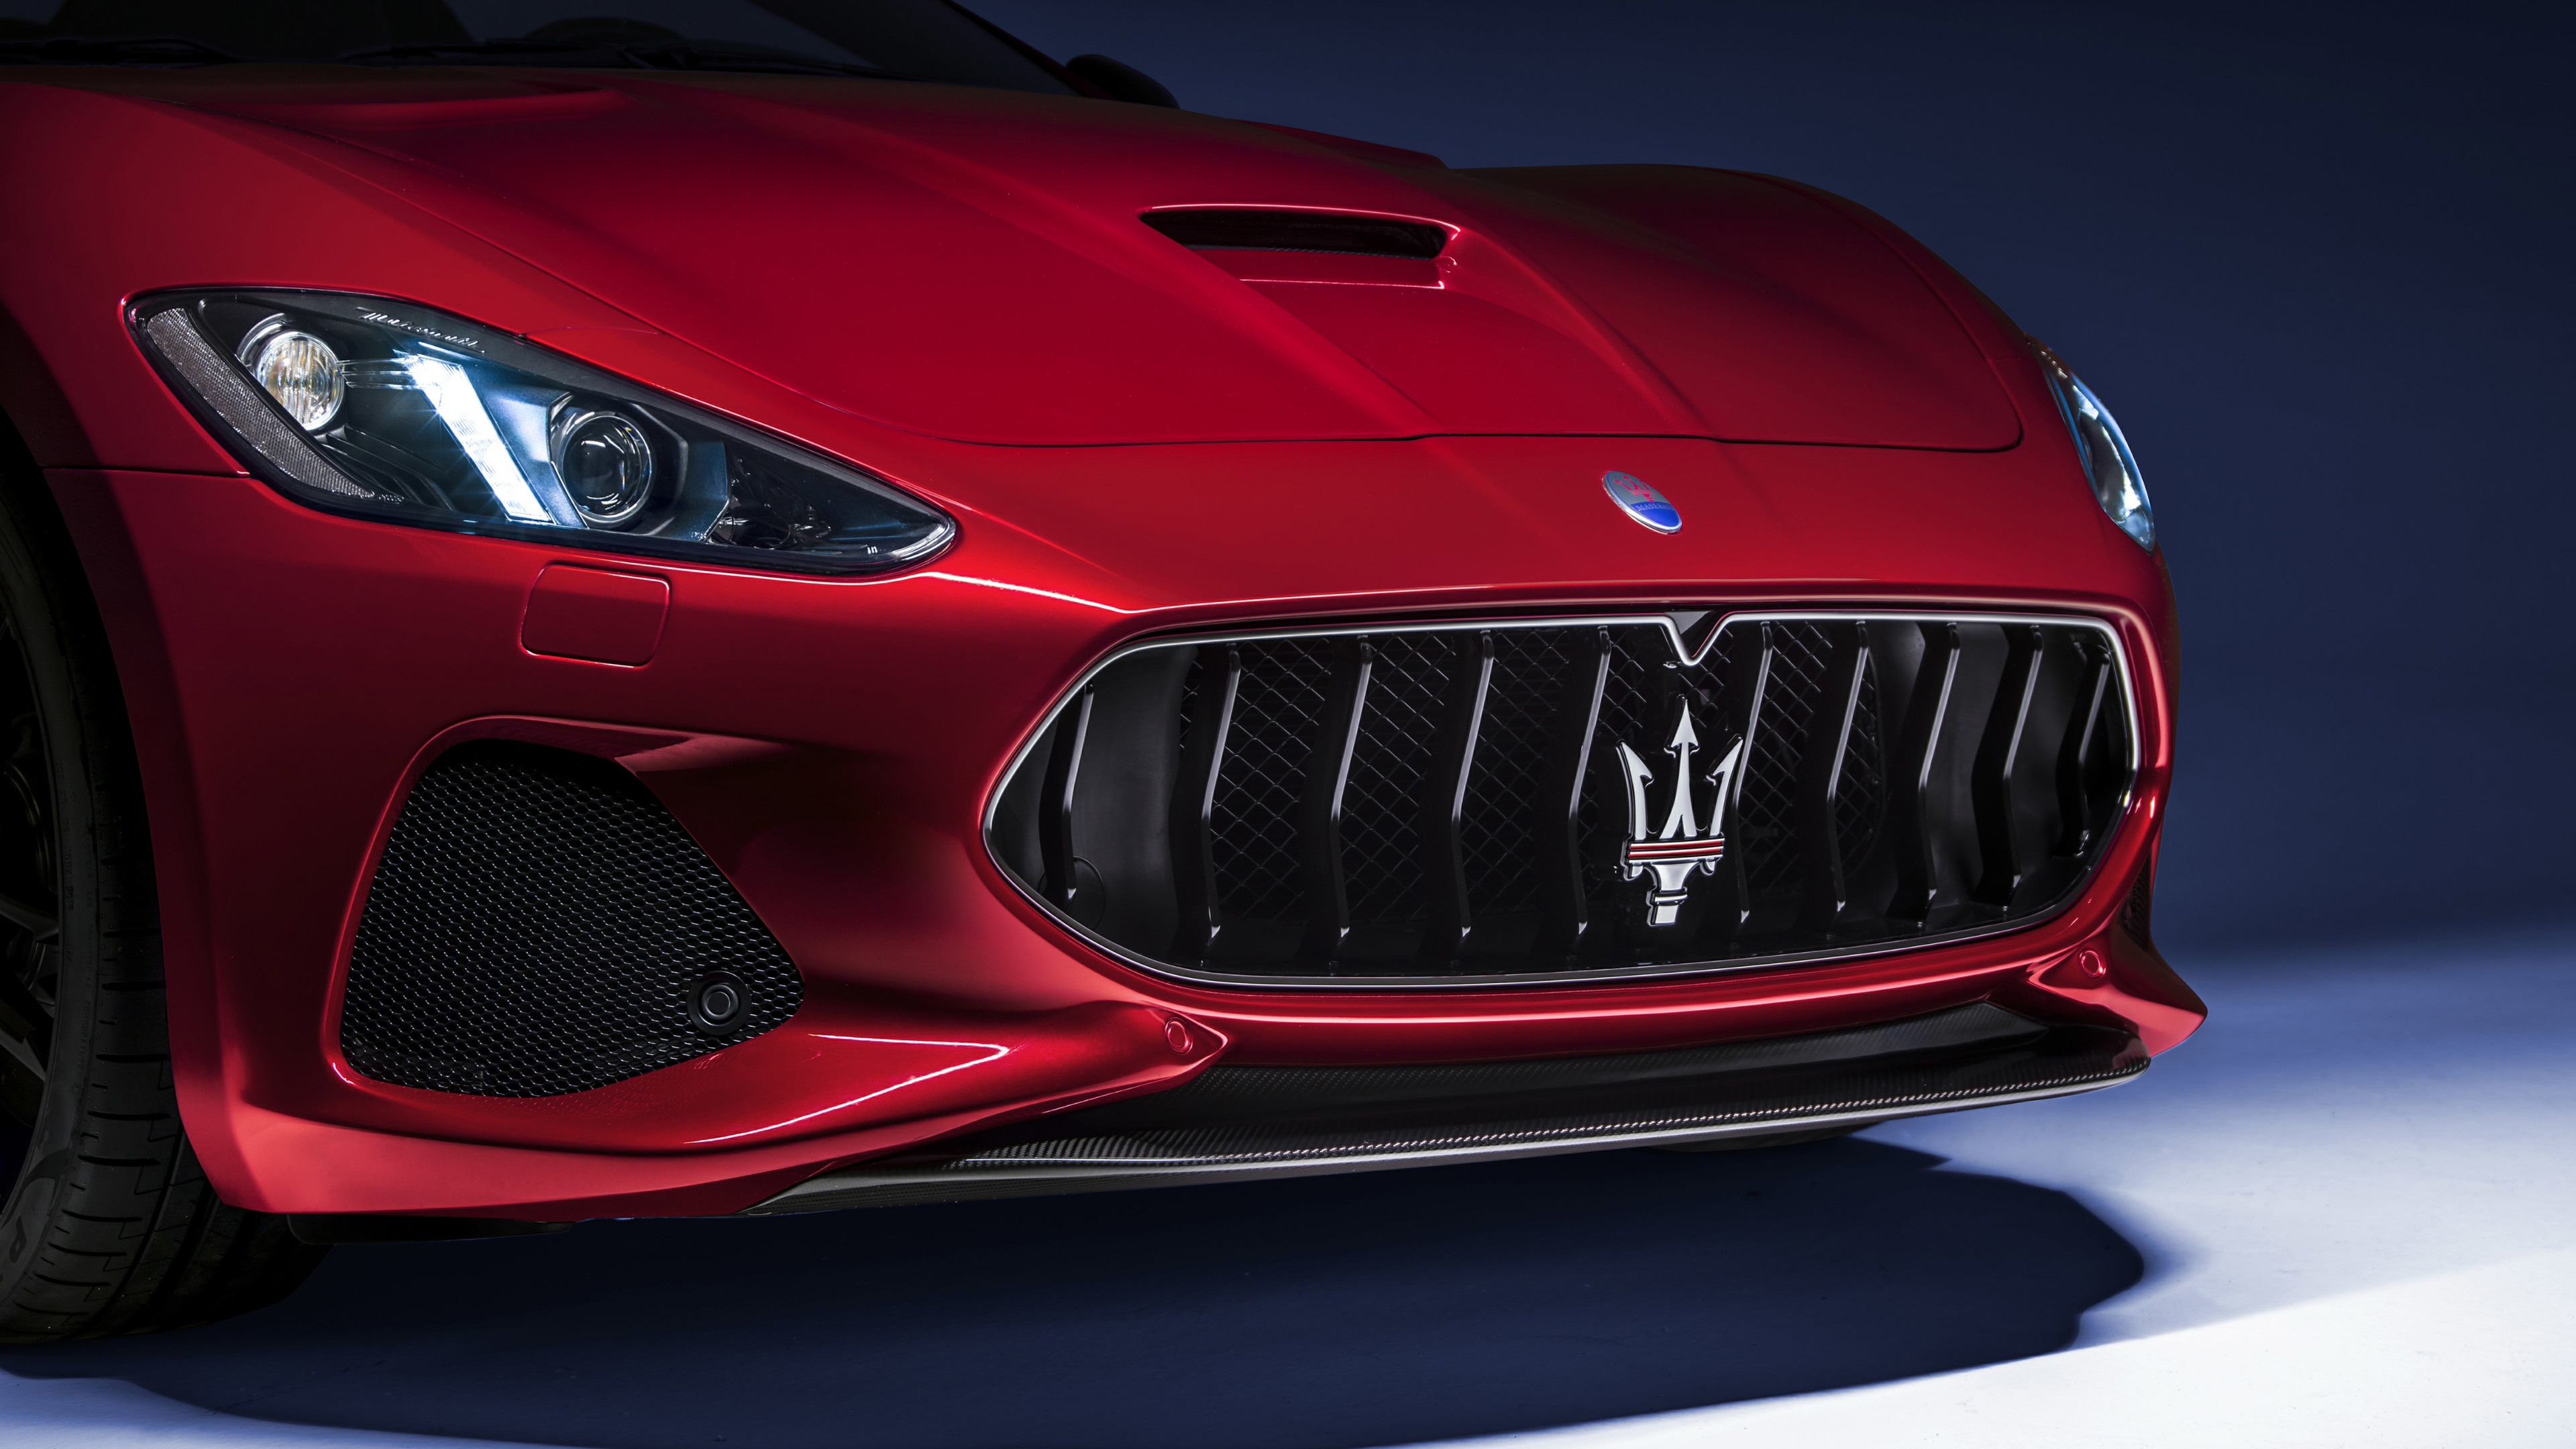 maserati granturismo 2018 4k 1539105543 - Maserati GranTurismo 2018 4k - maserati wallpapers, maserati granturismo wallpapers, hd-wallpapers, cars wallpapers, 4k-wallpapers, 2018 cars wallpapers